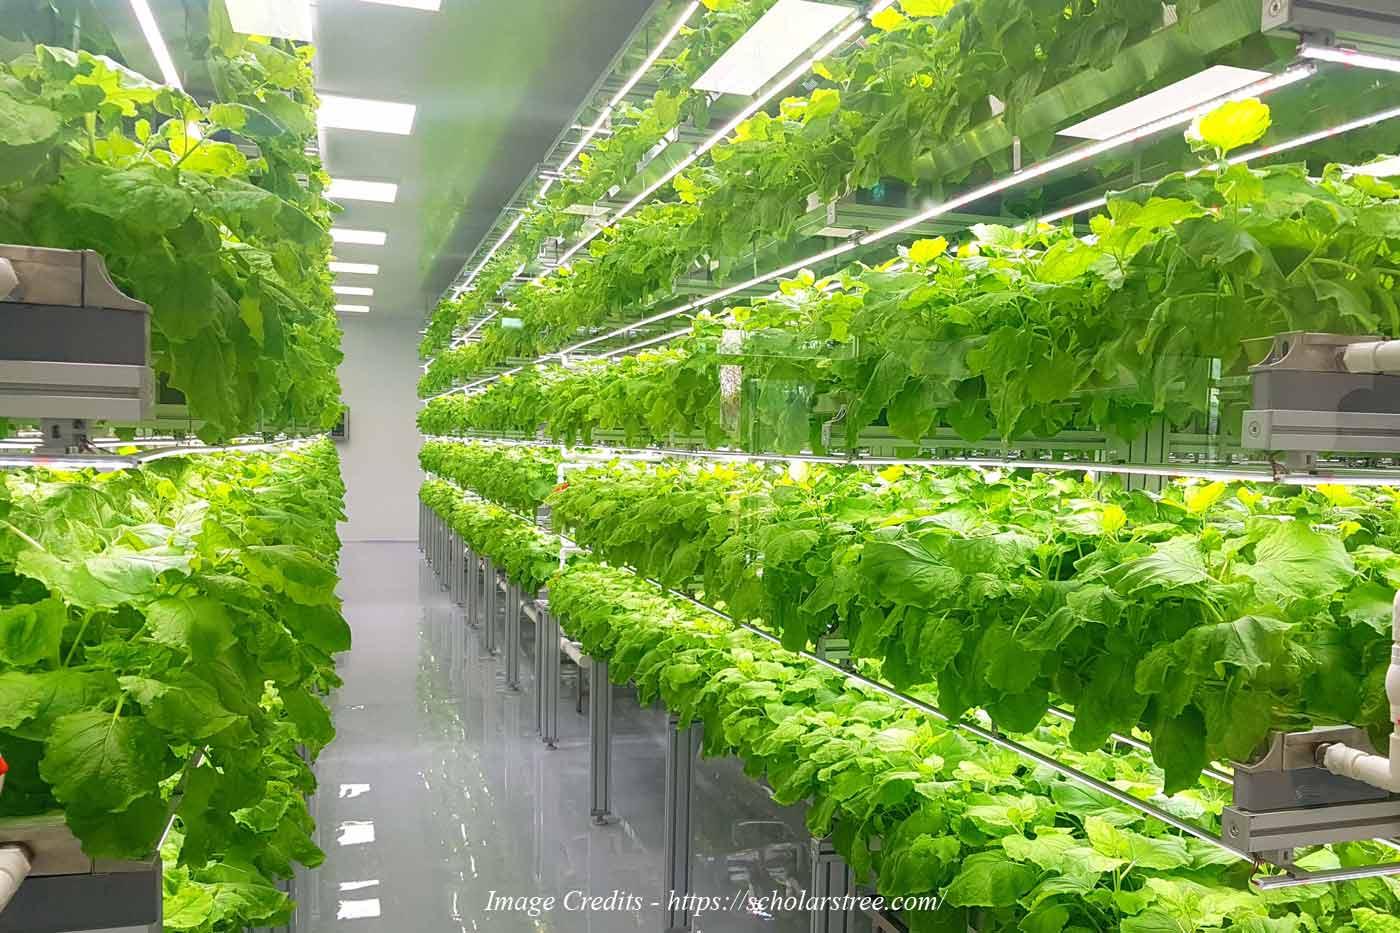 Vertical Farming: The Next Generation Farming